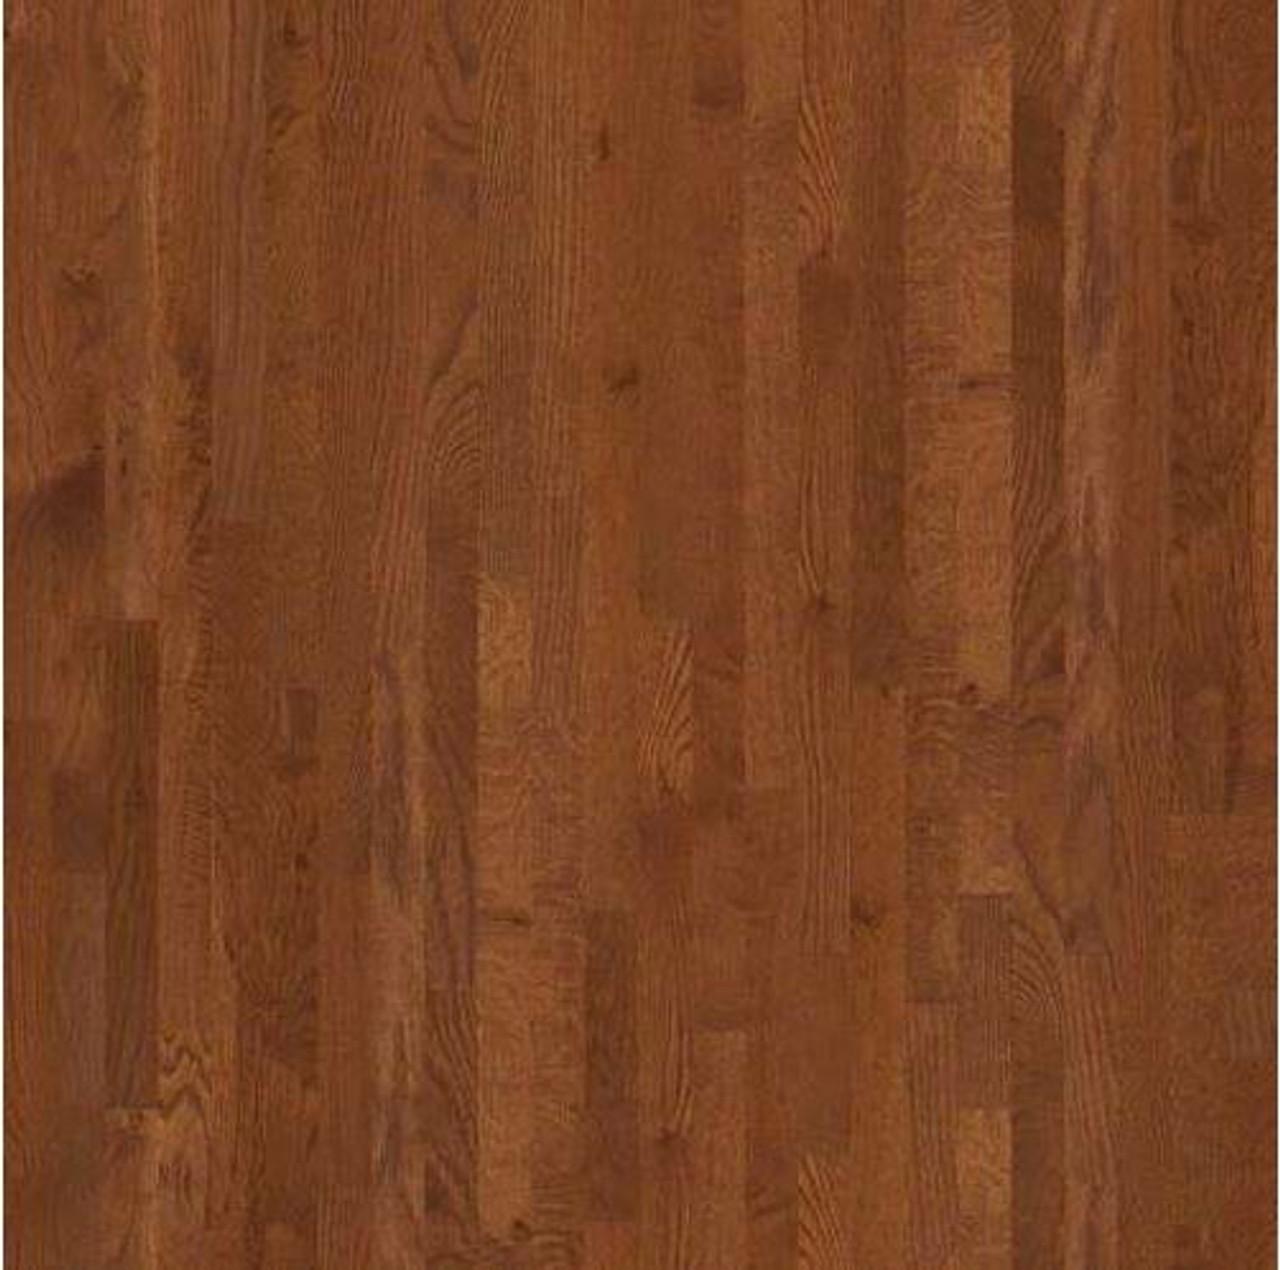 "Shaw Saddle | 2-1/4"" x 3/4"" | Solid Hardwood | 1st Quality [25 SF / Box]"